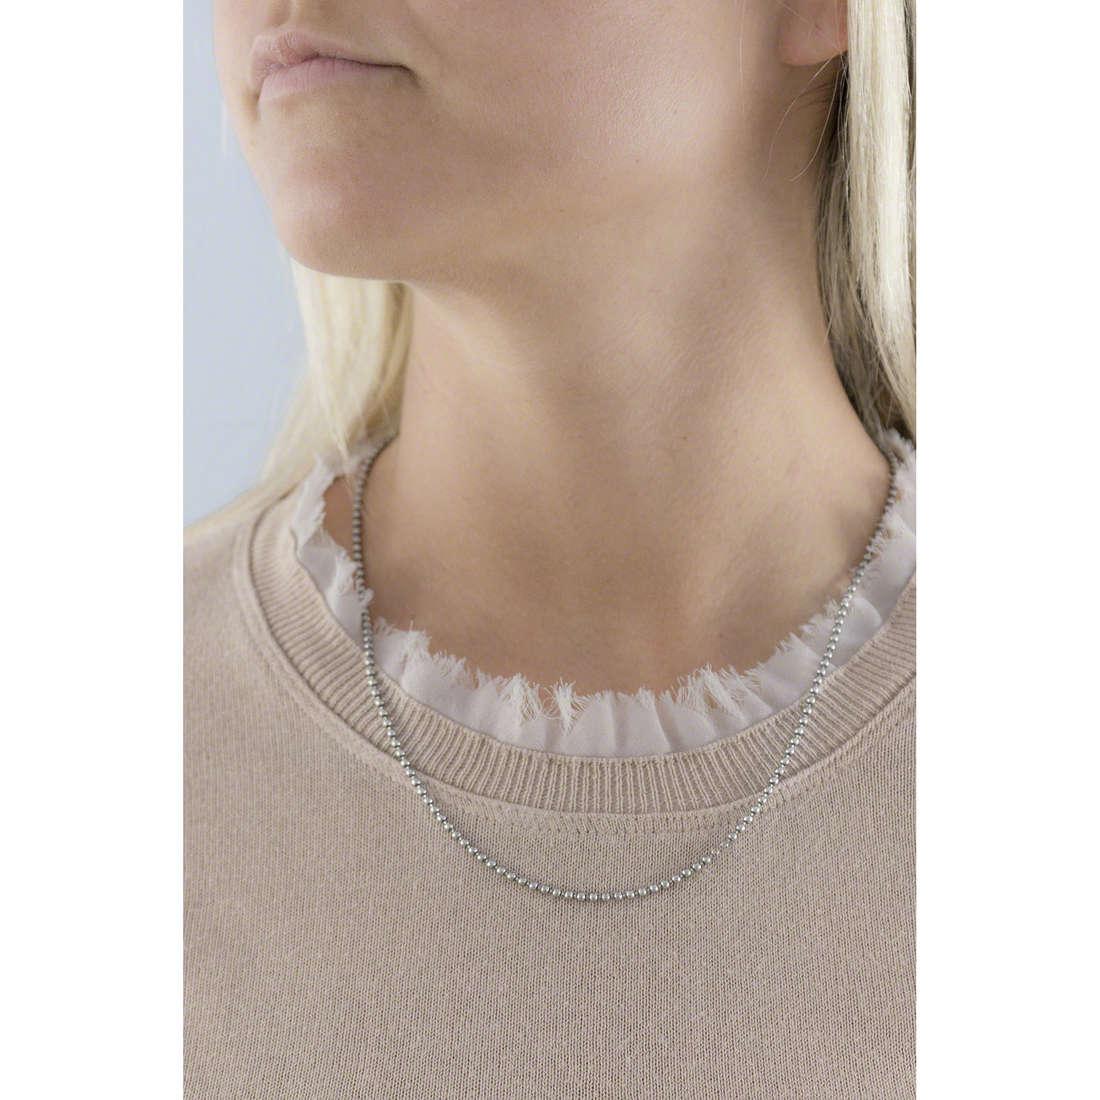 GioiaPura necklaces woman GPSRSCL0021-50-CF indosso